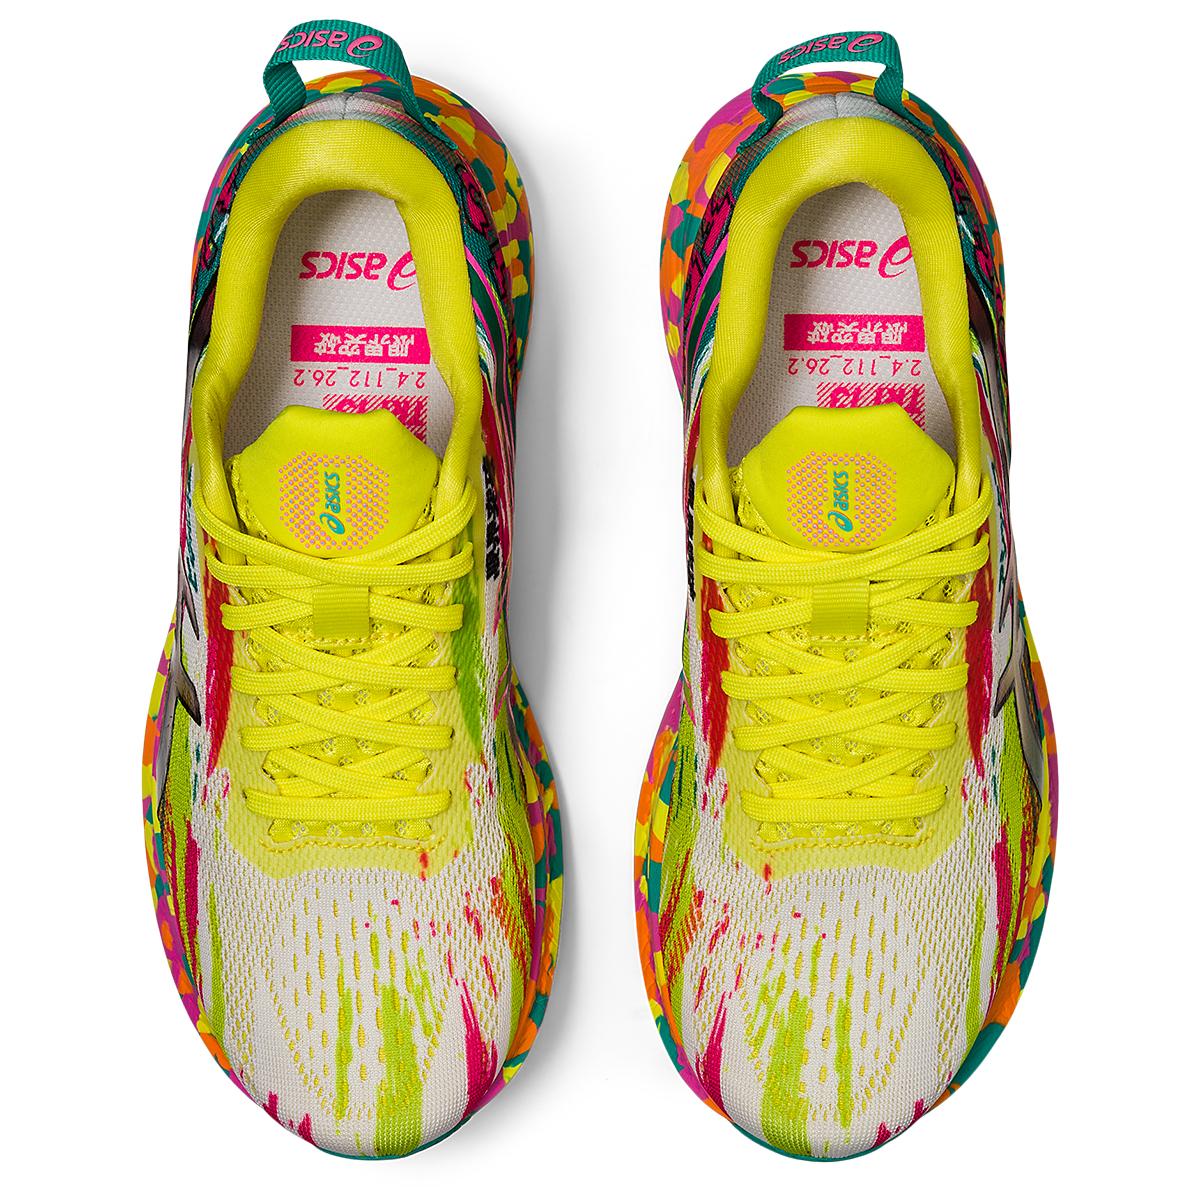 Women's Asics Noosa Tri 13 Running Shoe - Color: Hot Pink/Sour Yuzu - Size: 5 - Width: Regular, Hot Pink/Sour Yuzu, large, image 7